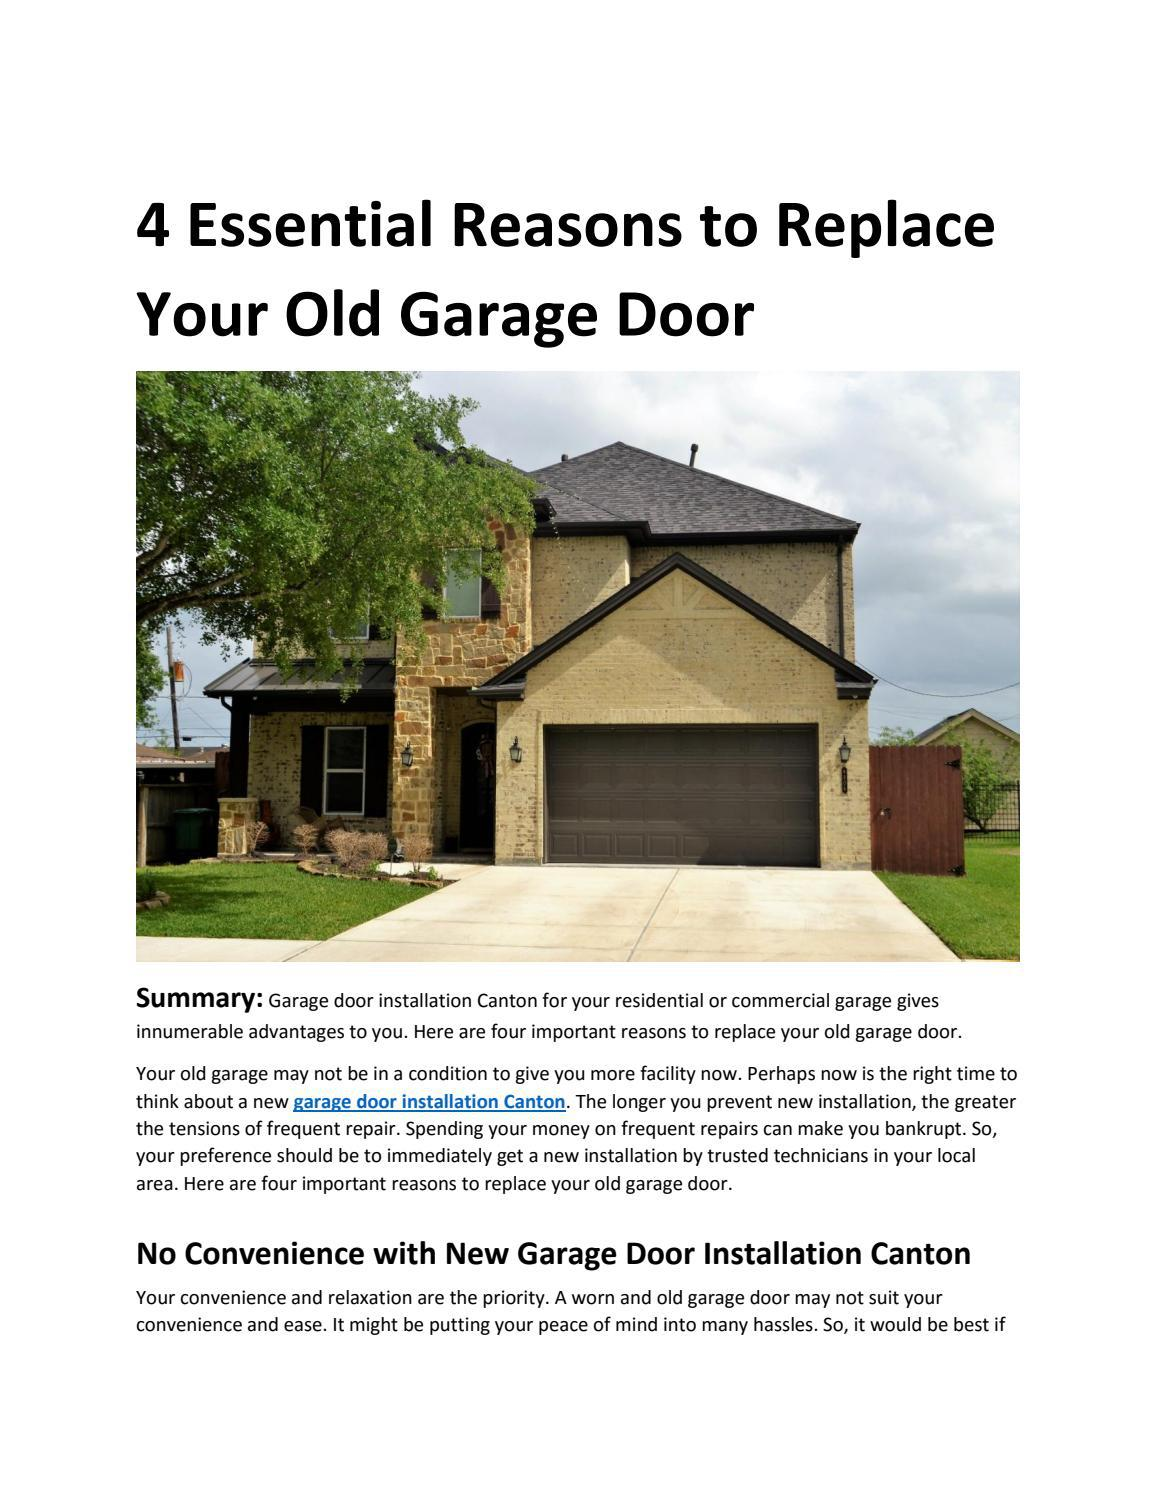 4 Essential Reasons to Replace Your Old Garage Door